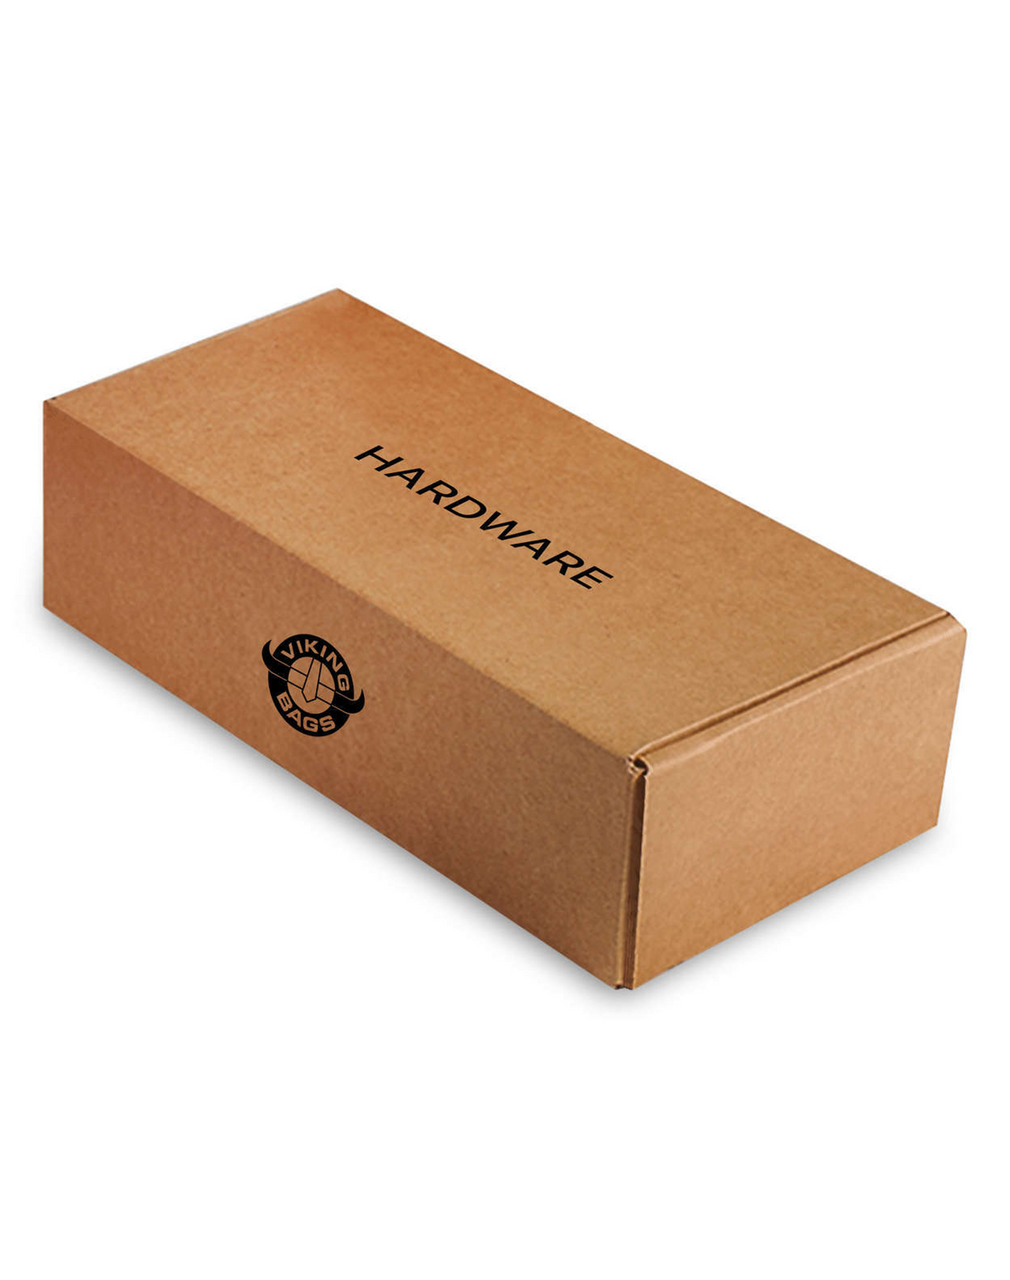 Triumph Thunderbird Viking Lamellar Large Black Hard Saddlebags Box